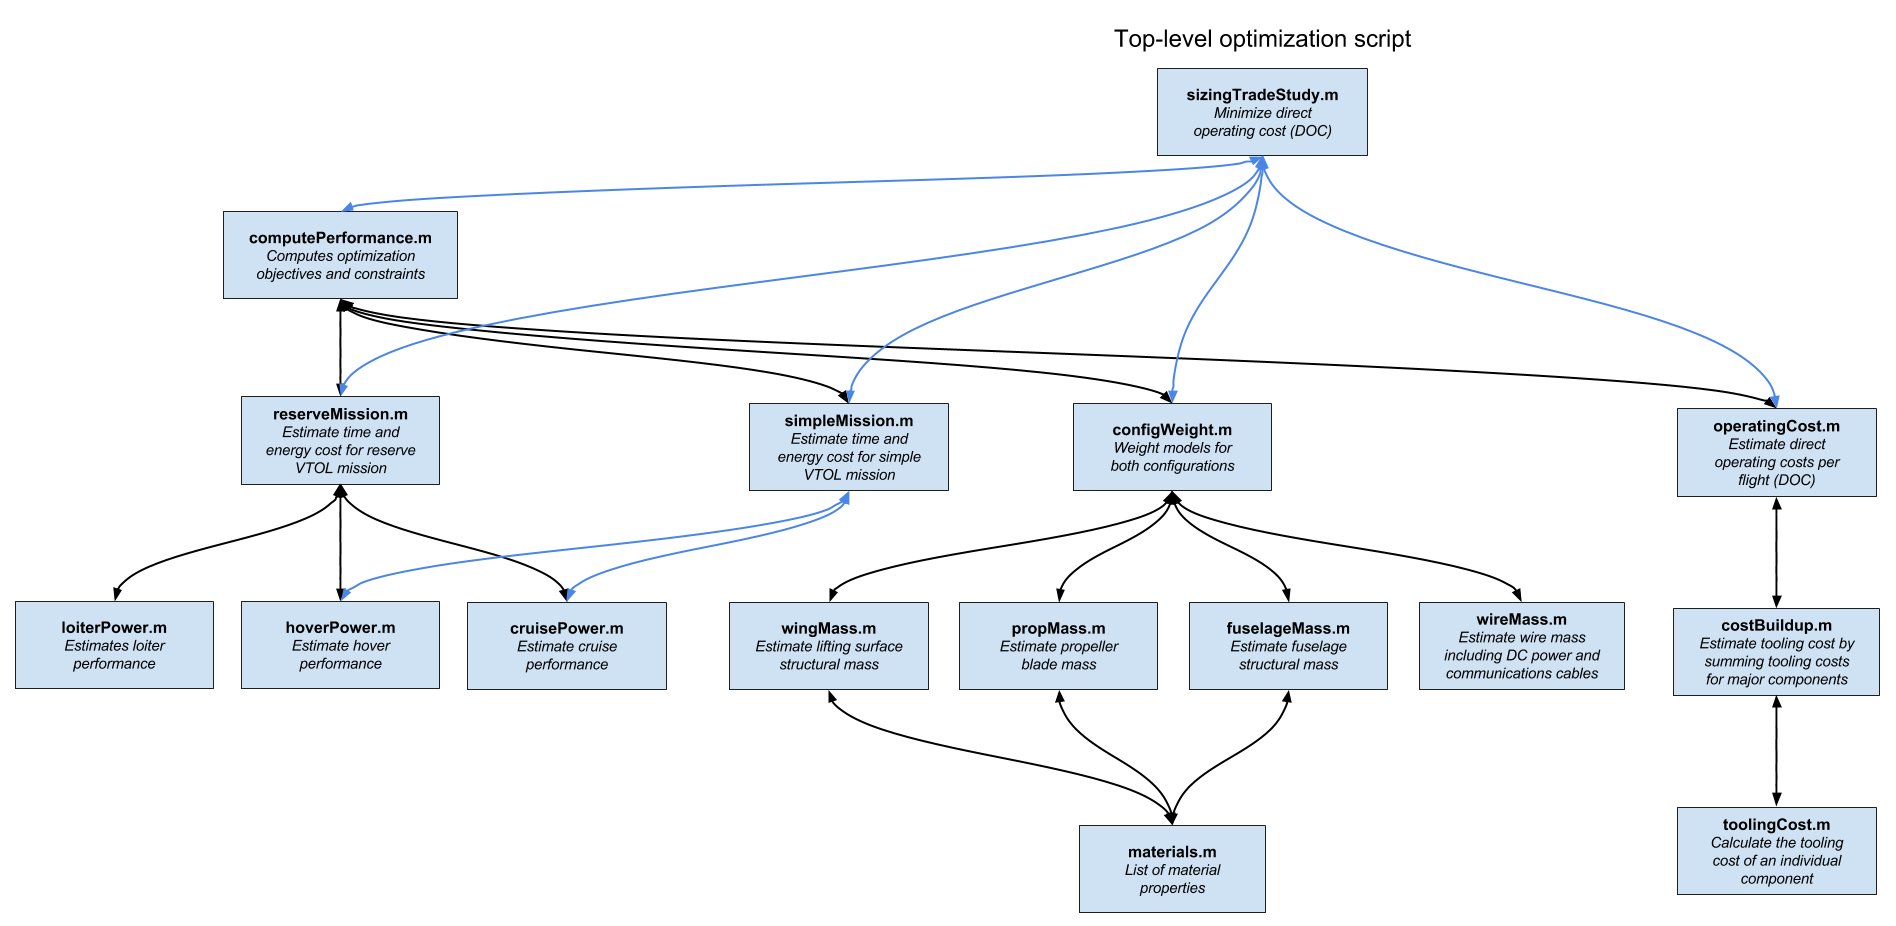 A^3 Vahana configuration trade study code structure    Source:  METAMORPH, INC.